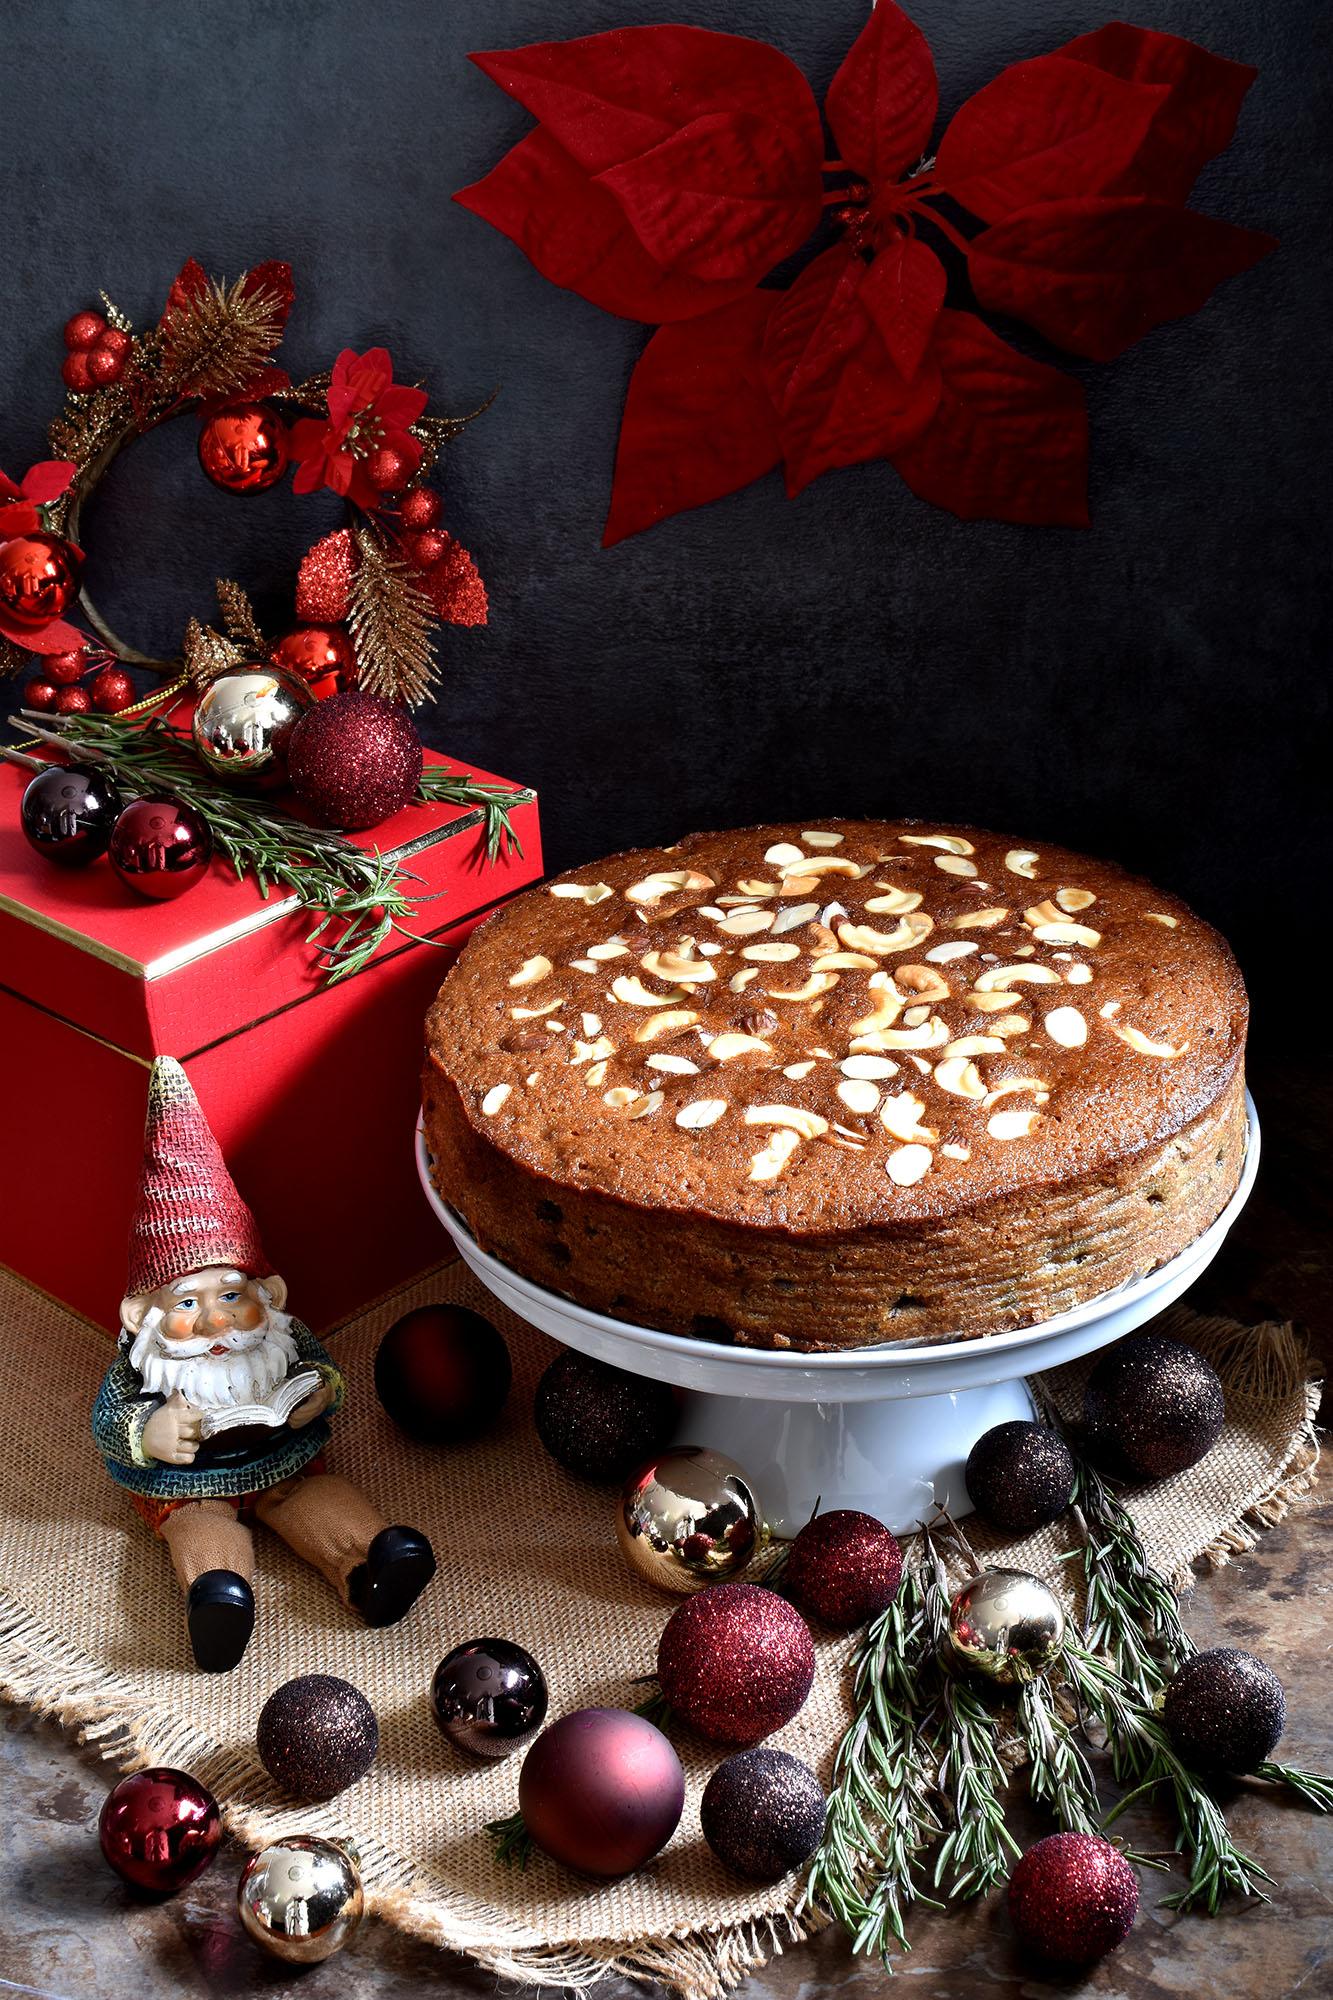 Christmas Fruit Cake.Christmas Fruit Cake Non Alcoholic